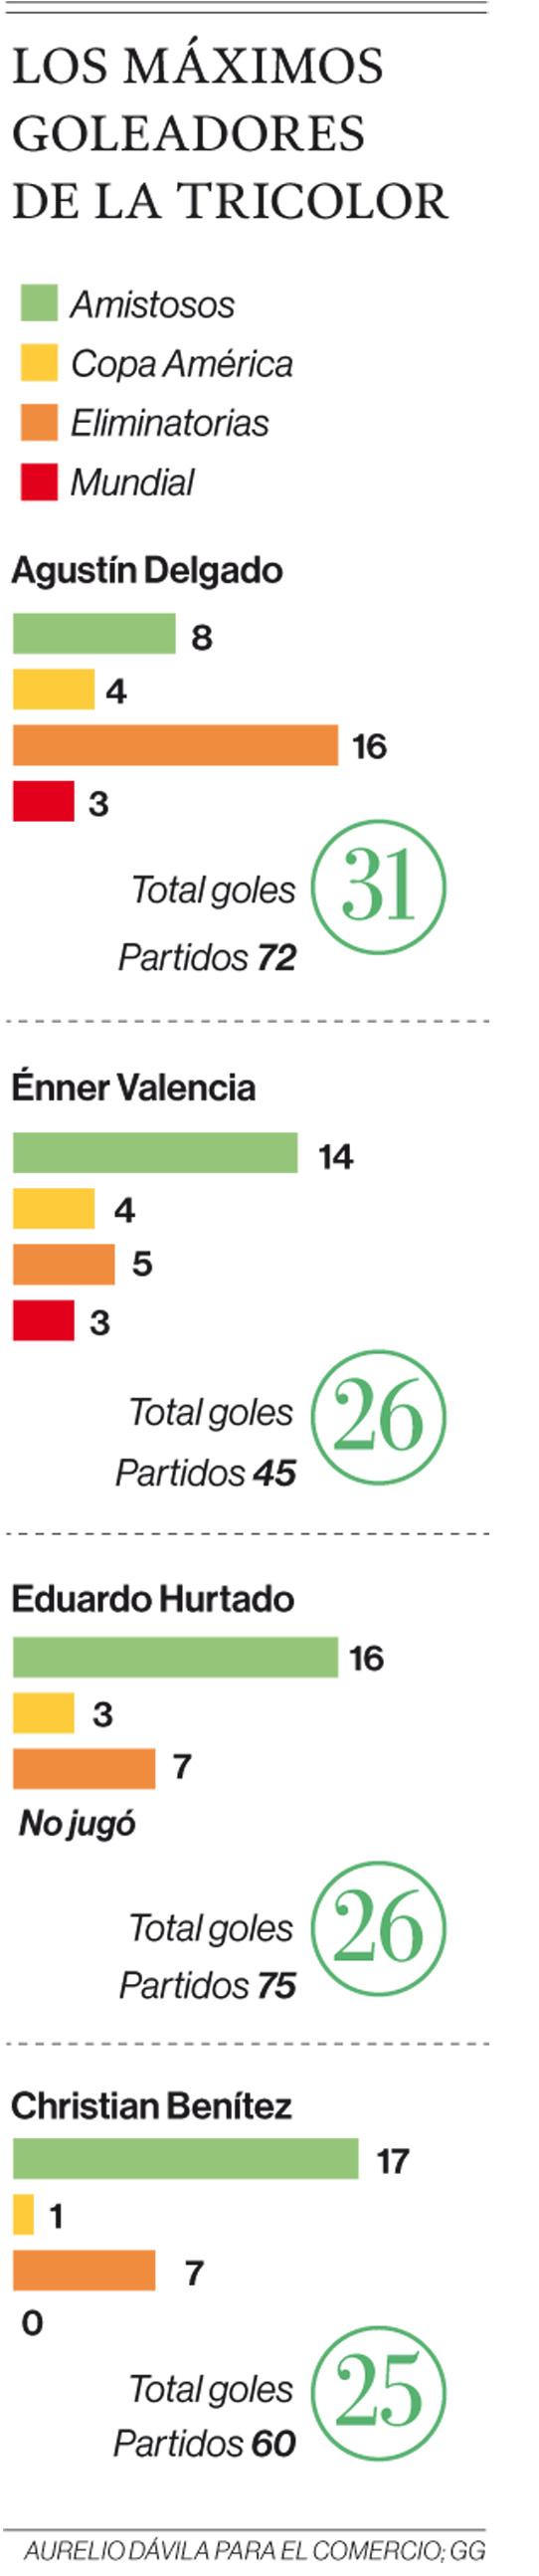 Énner Valencia lacks the label Agustín Delgado